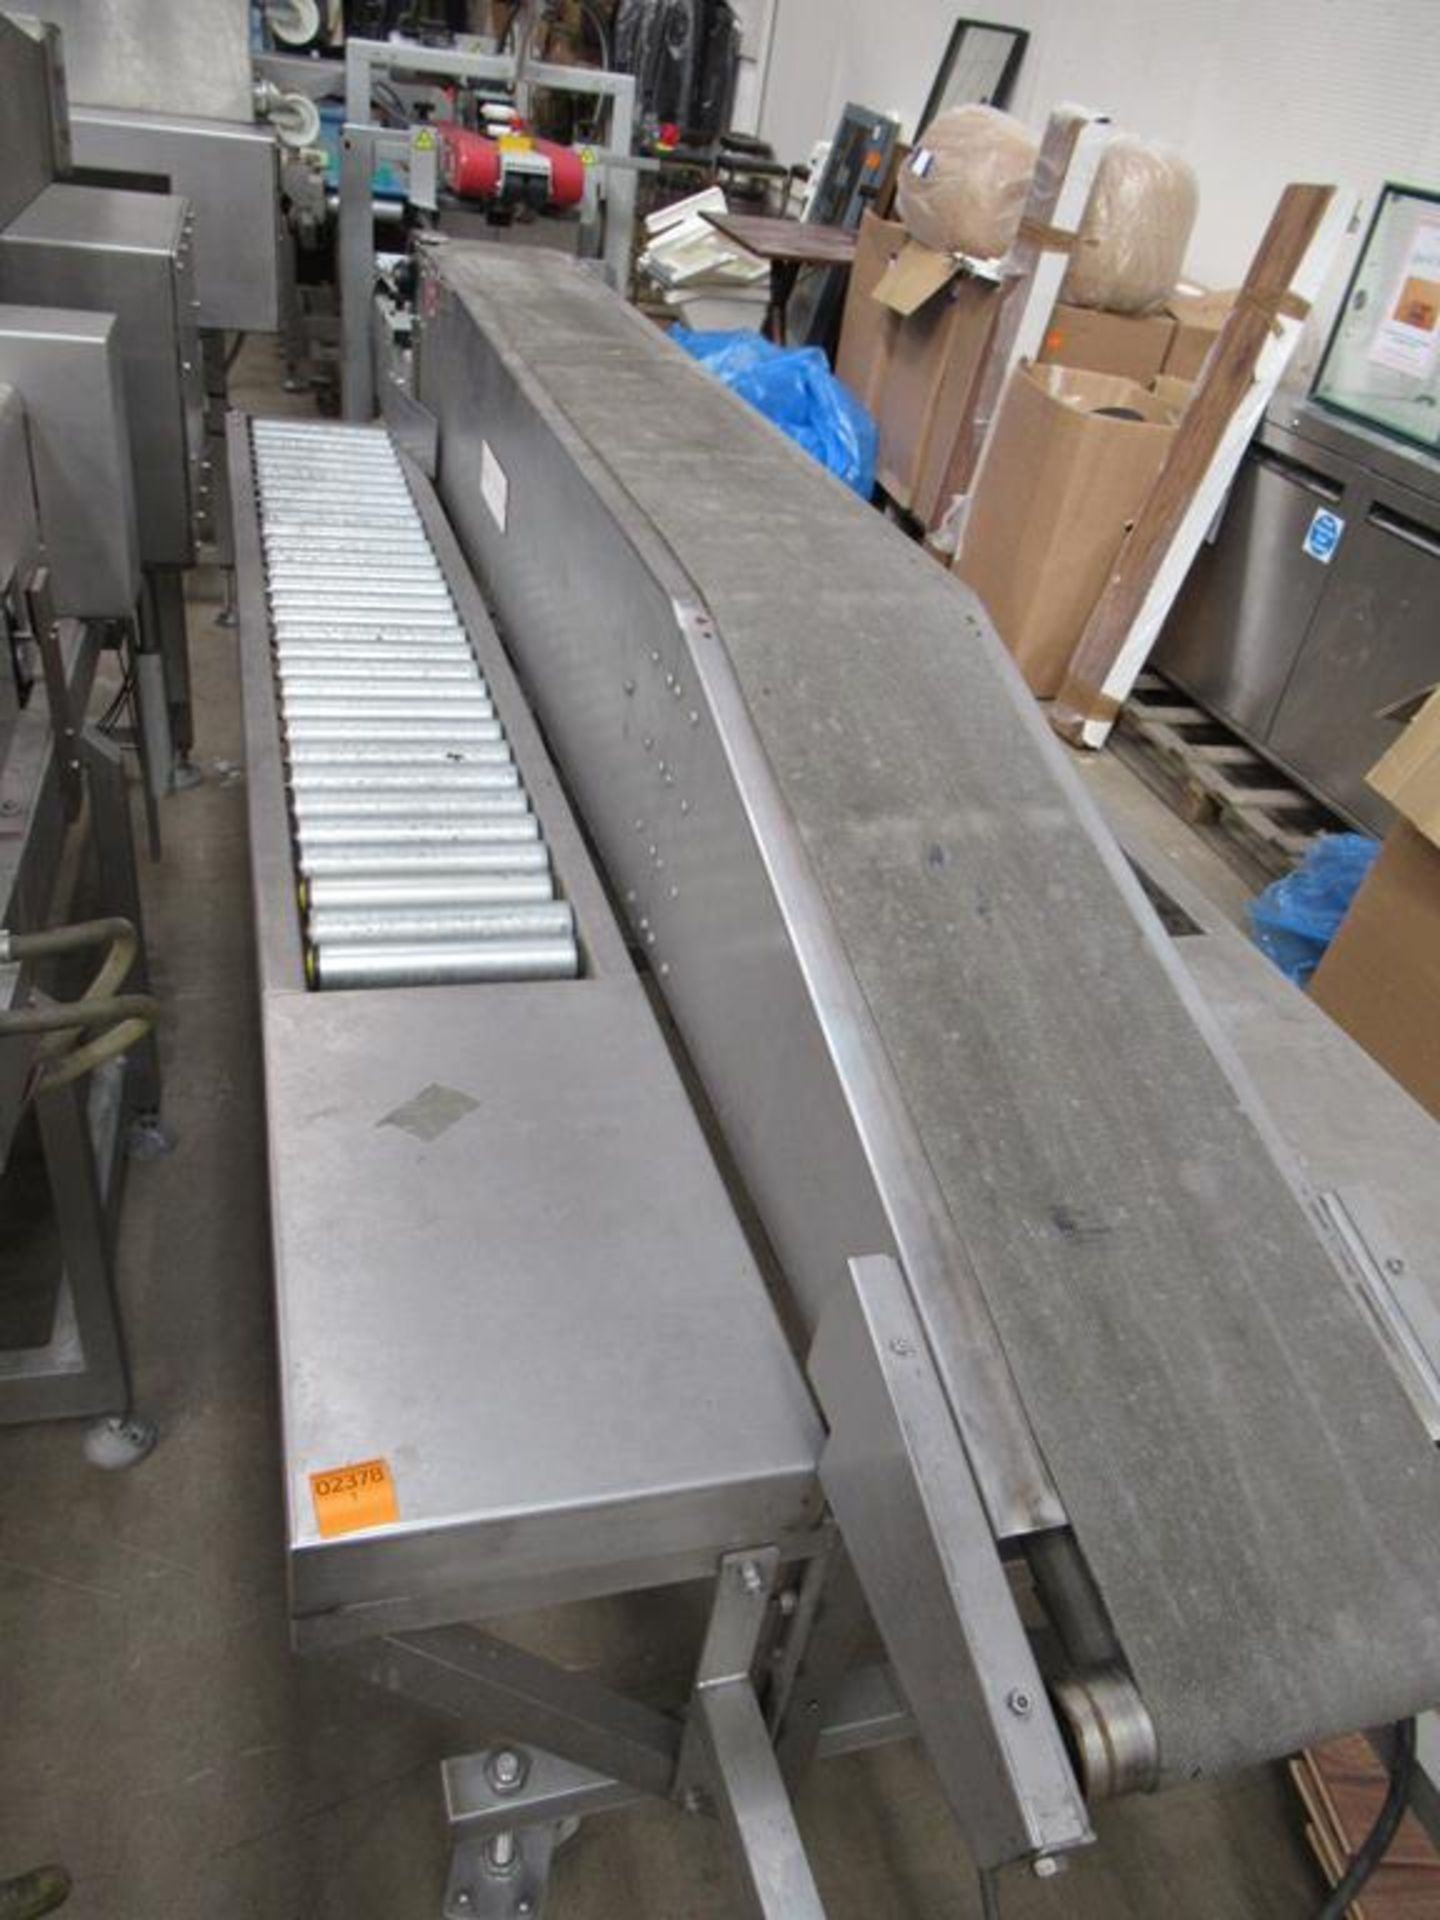 Unbranded Packing Conveyor on Castor Wheels - Image 4 of 4